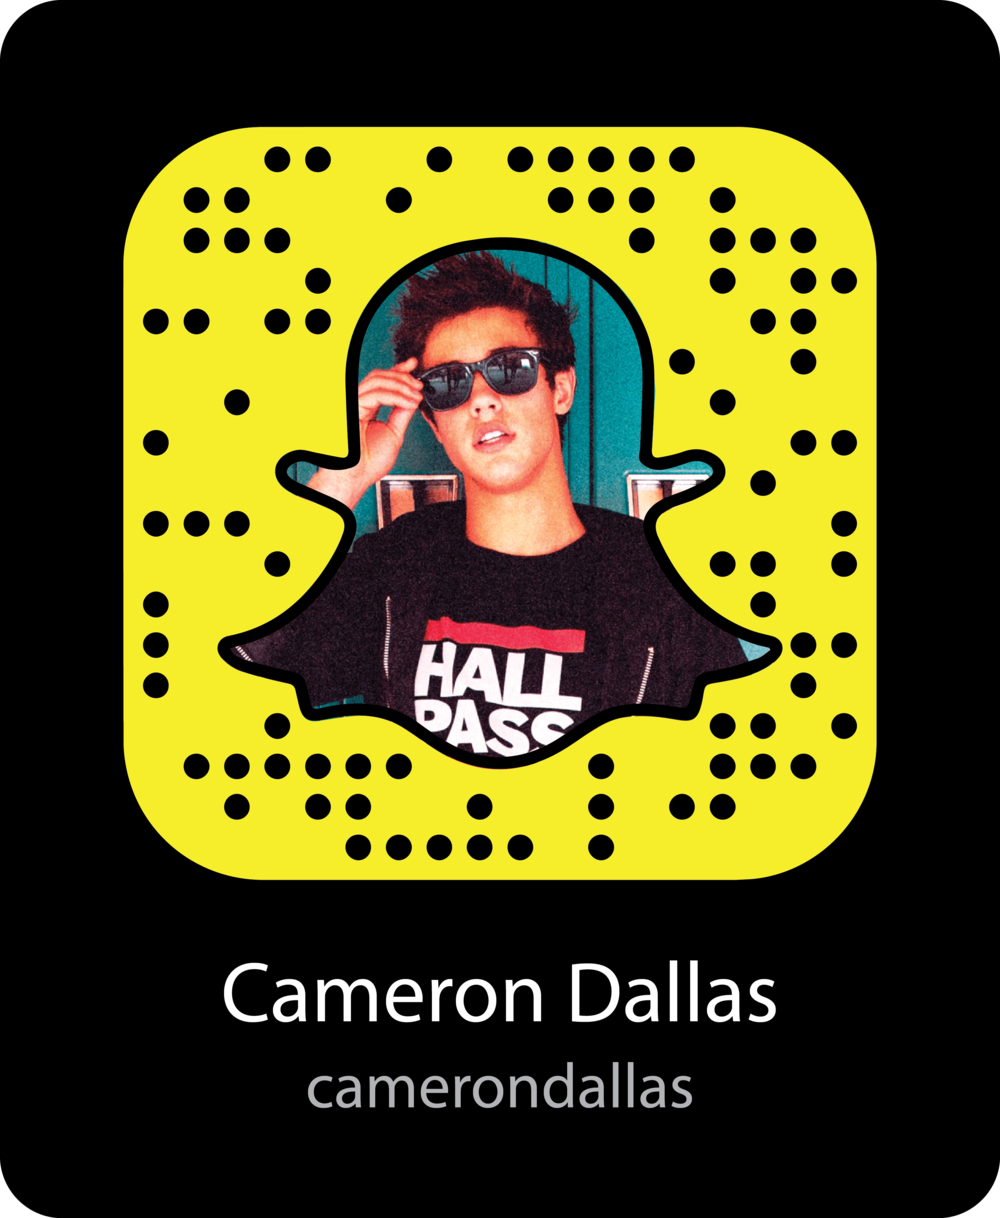 cameron-dallas-vine-celebrity-snapchat-snapcode